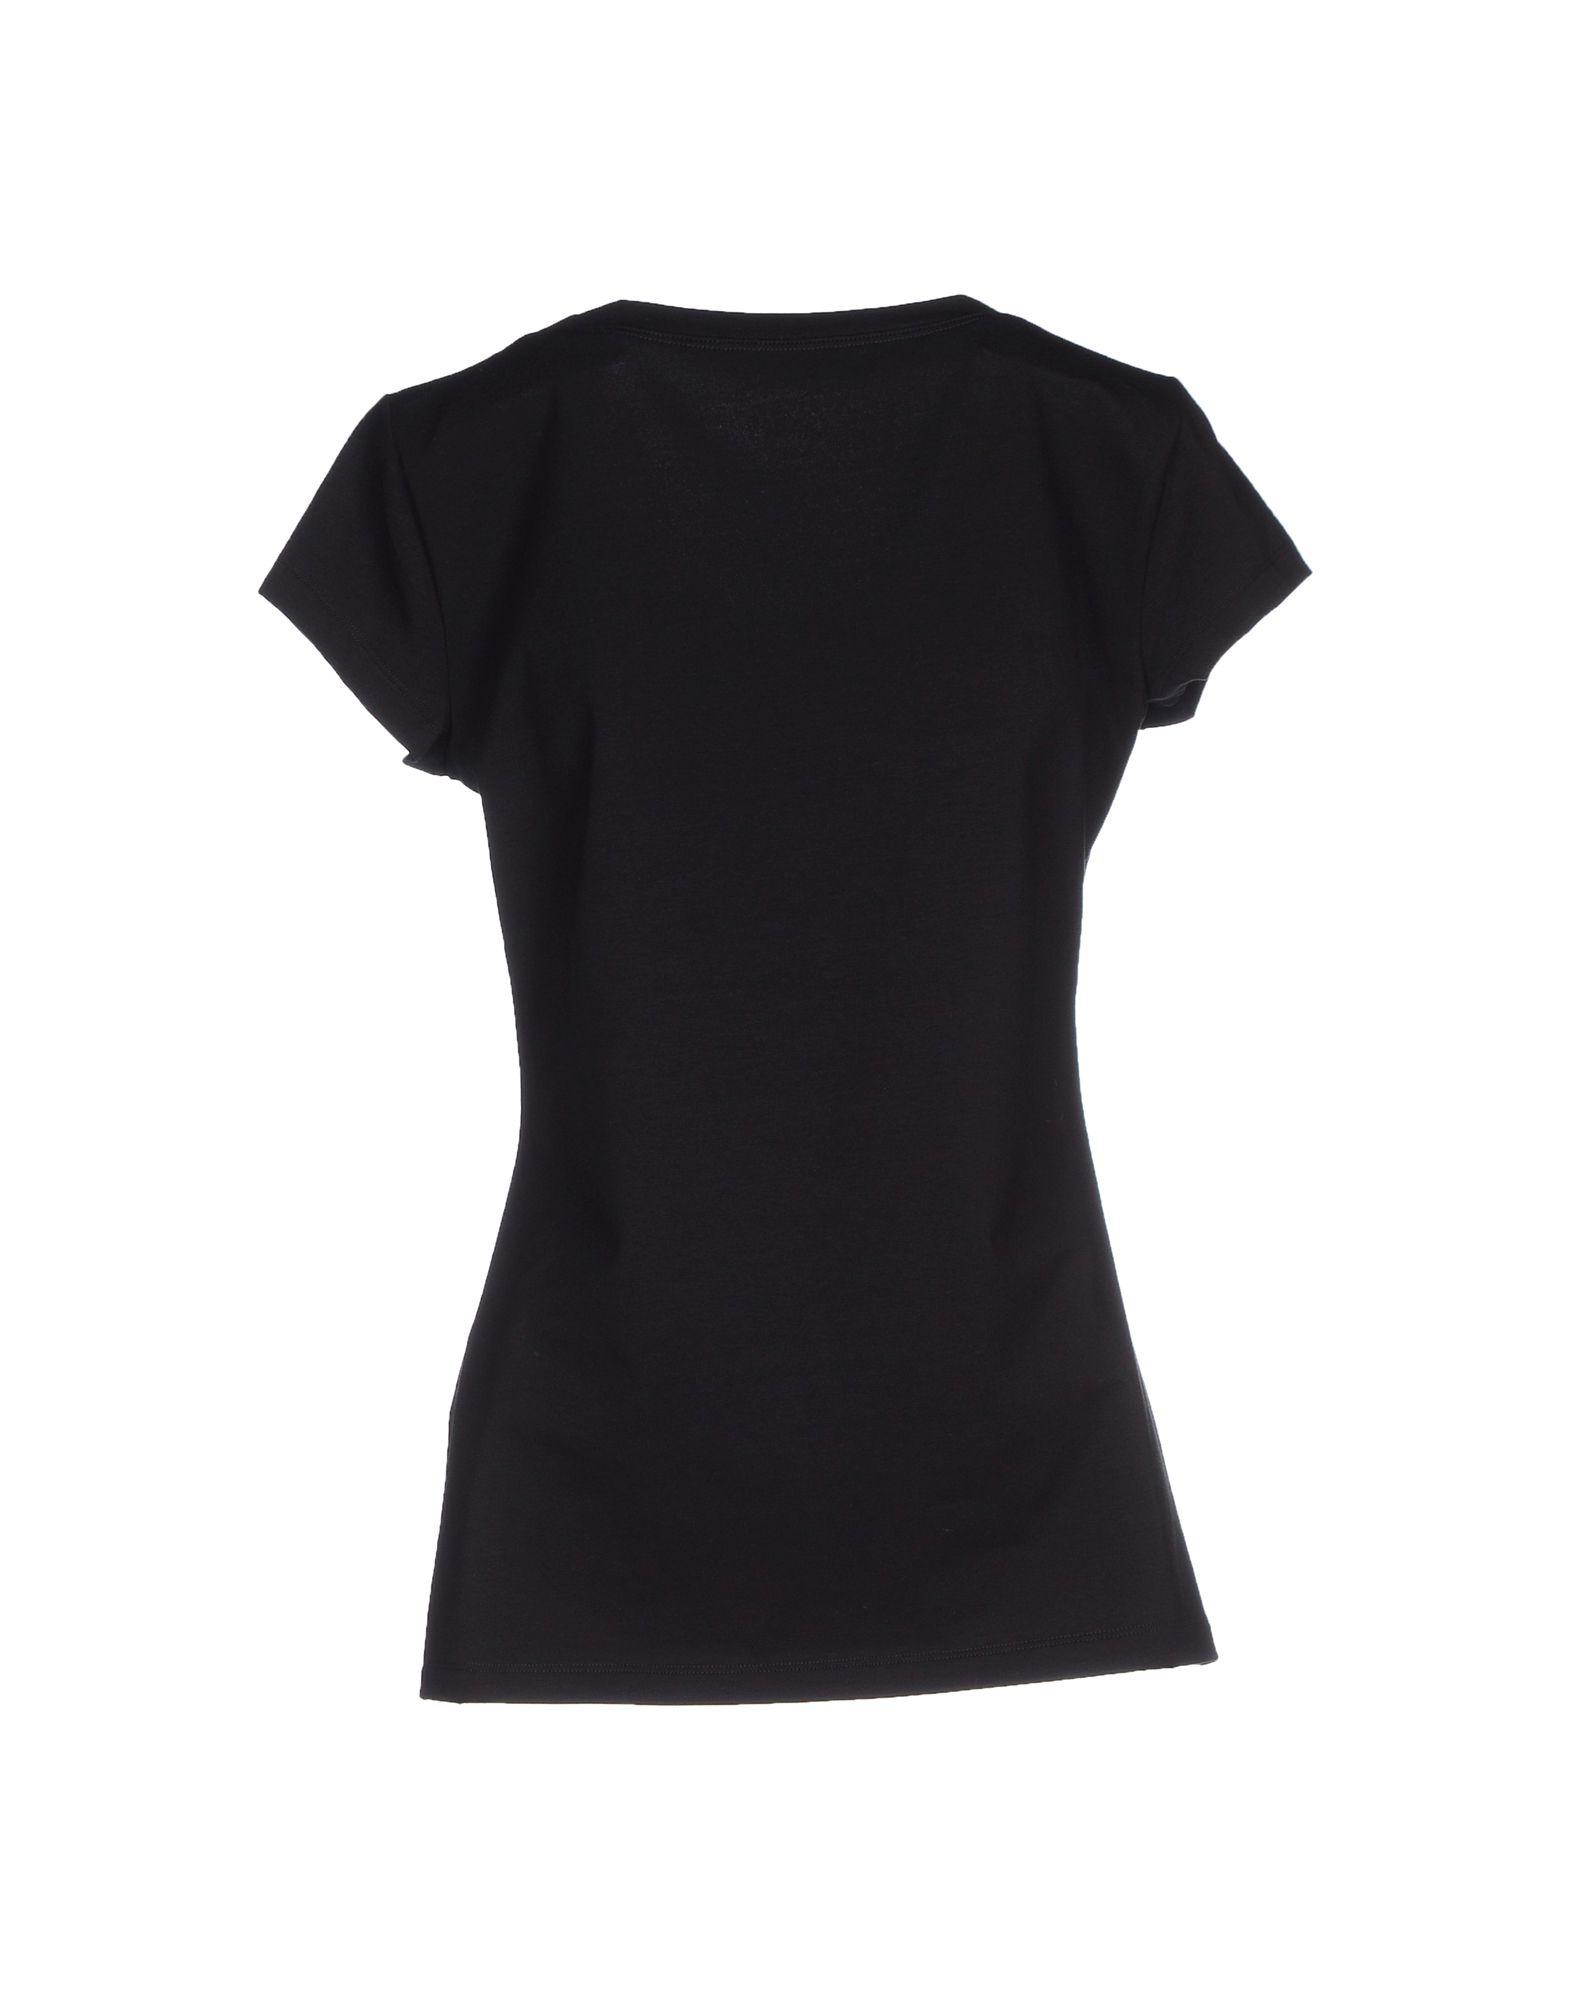 lyst calvin klein jeans t shirt in black. Black Bedroom Furniture Sets. Home Design Ideas